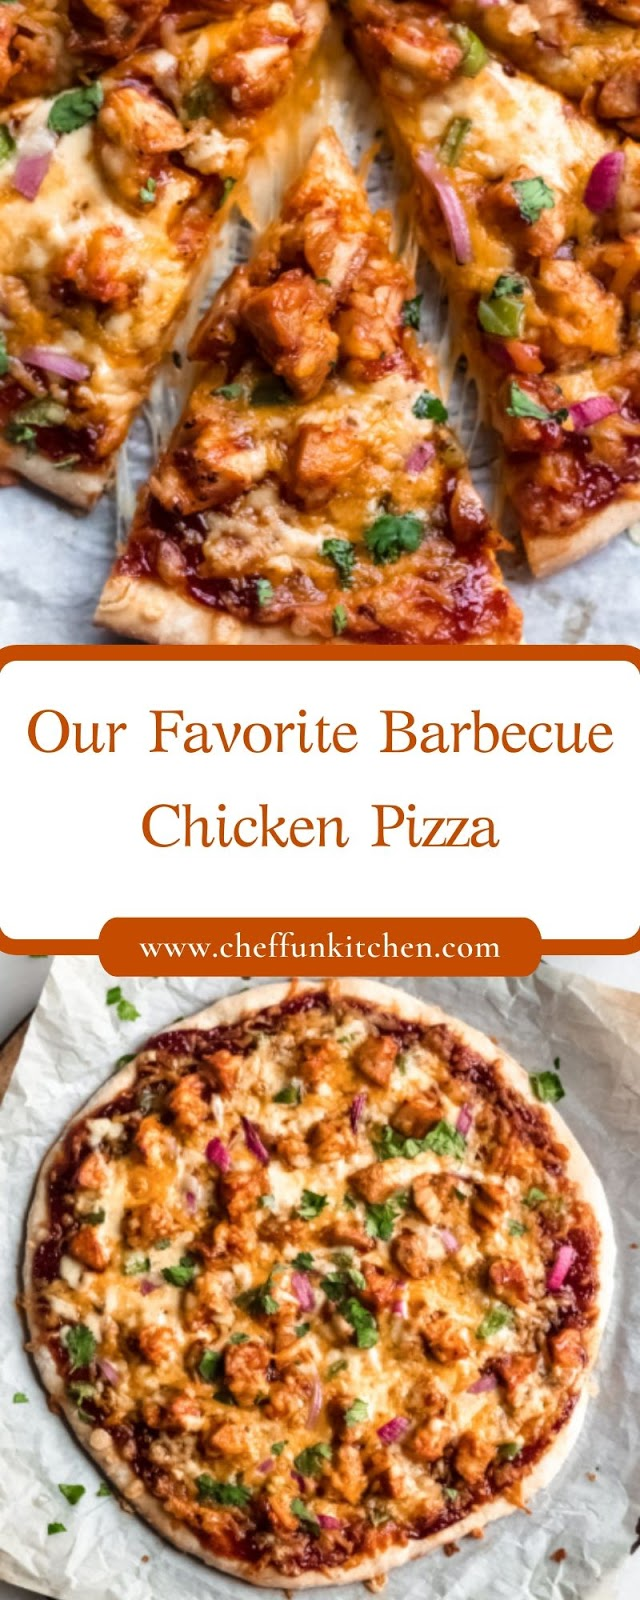 Our Favorite Barbecue Chicken Pizza